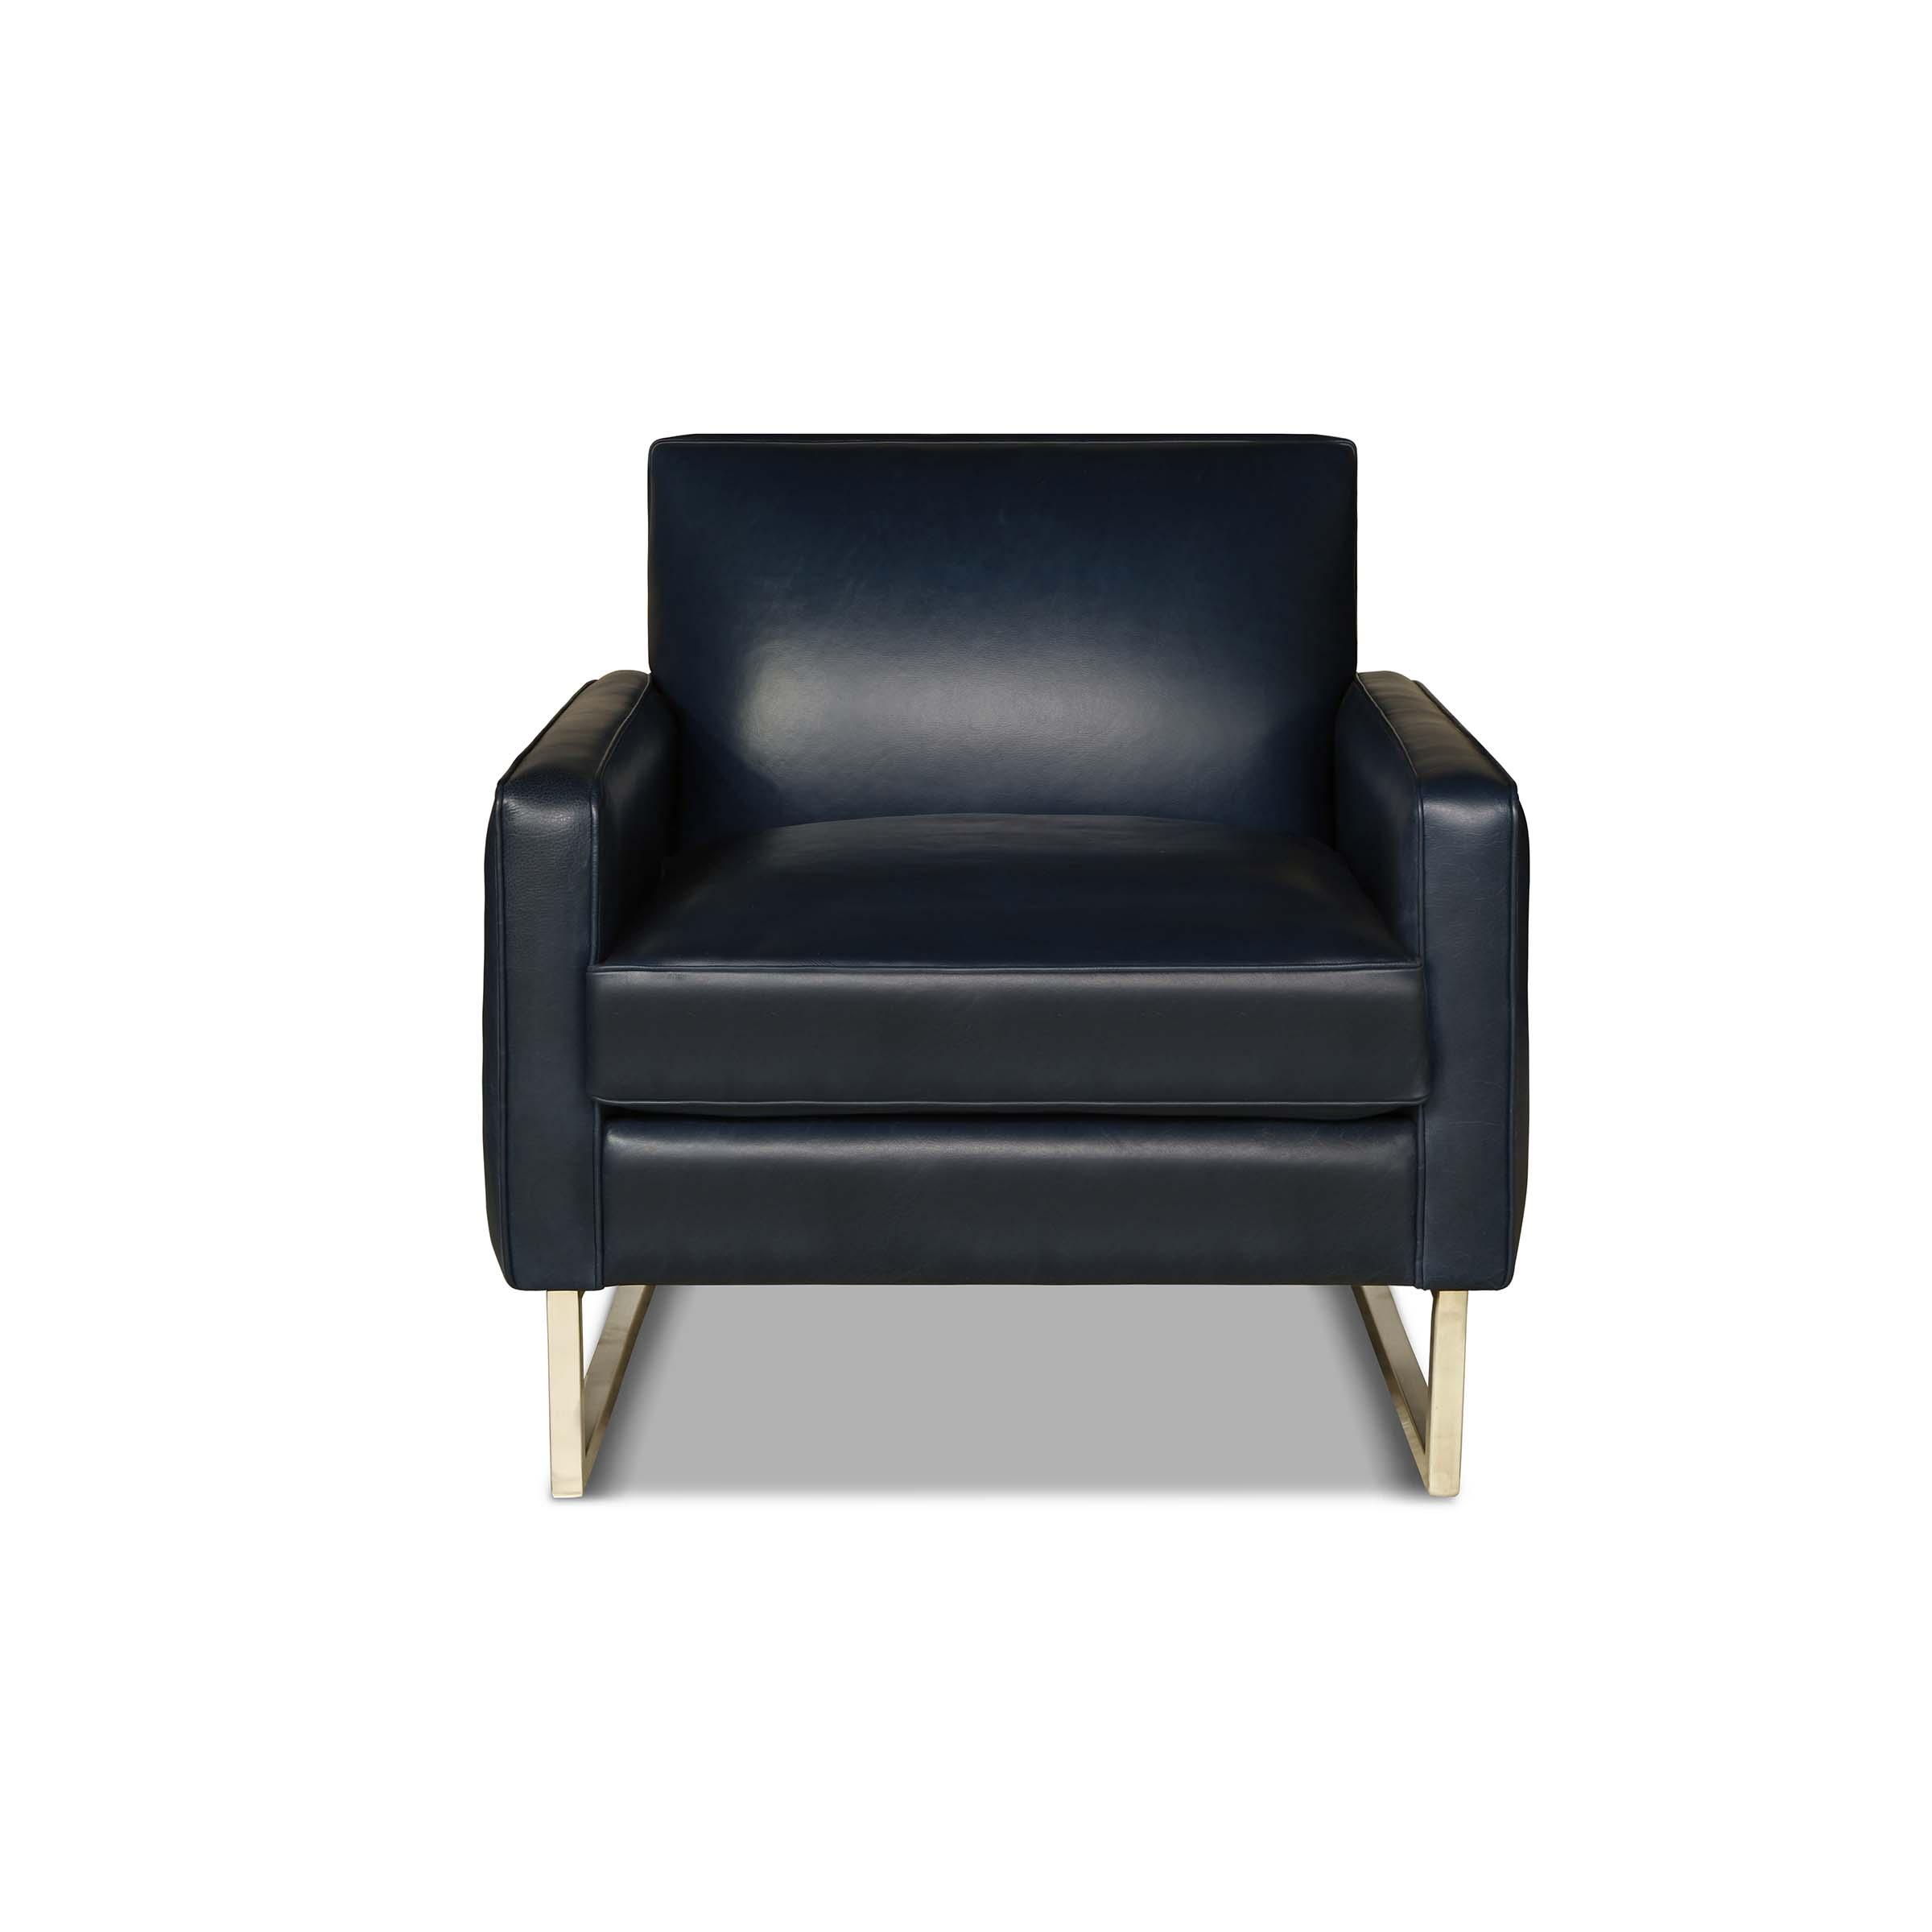 JACKSON - 10 Chair Amadeus Sapphire